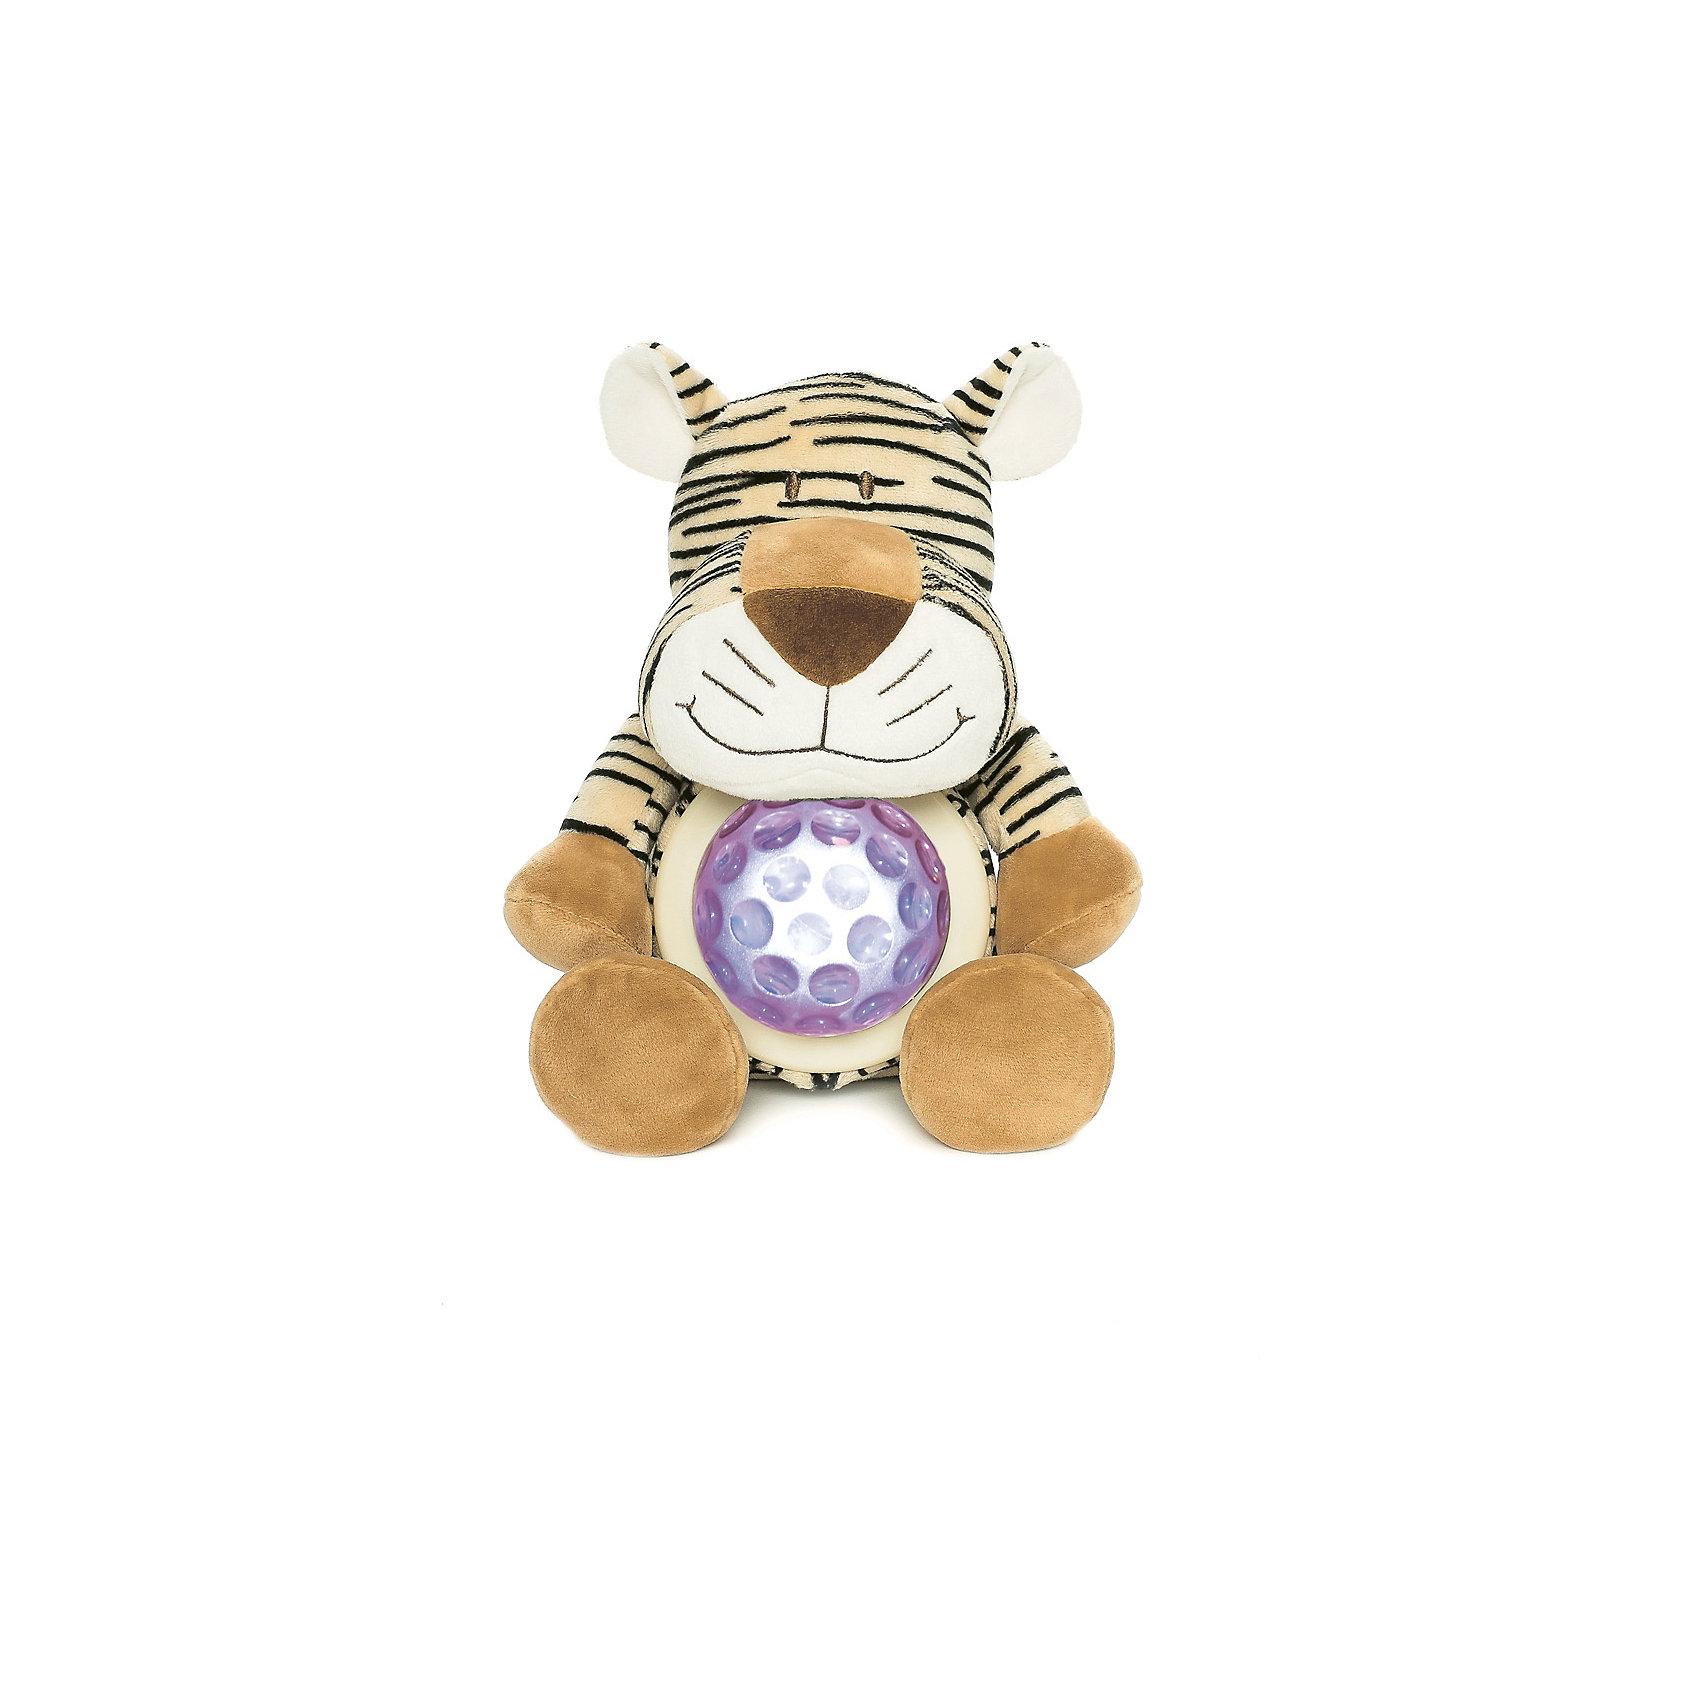 Teddykompaniet Ночник Тигр, Динглисар, Teddykompaniet ночник bradex звездное небо